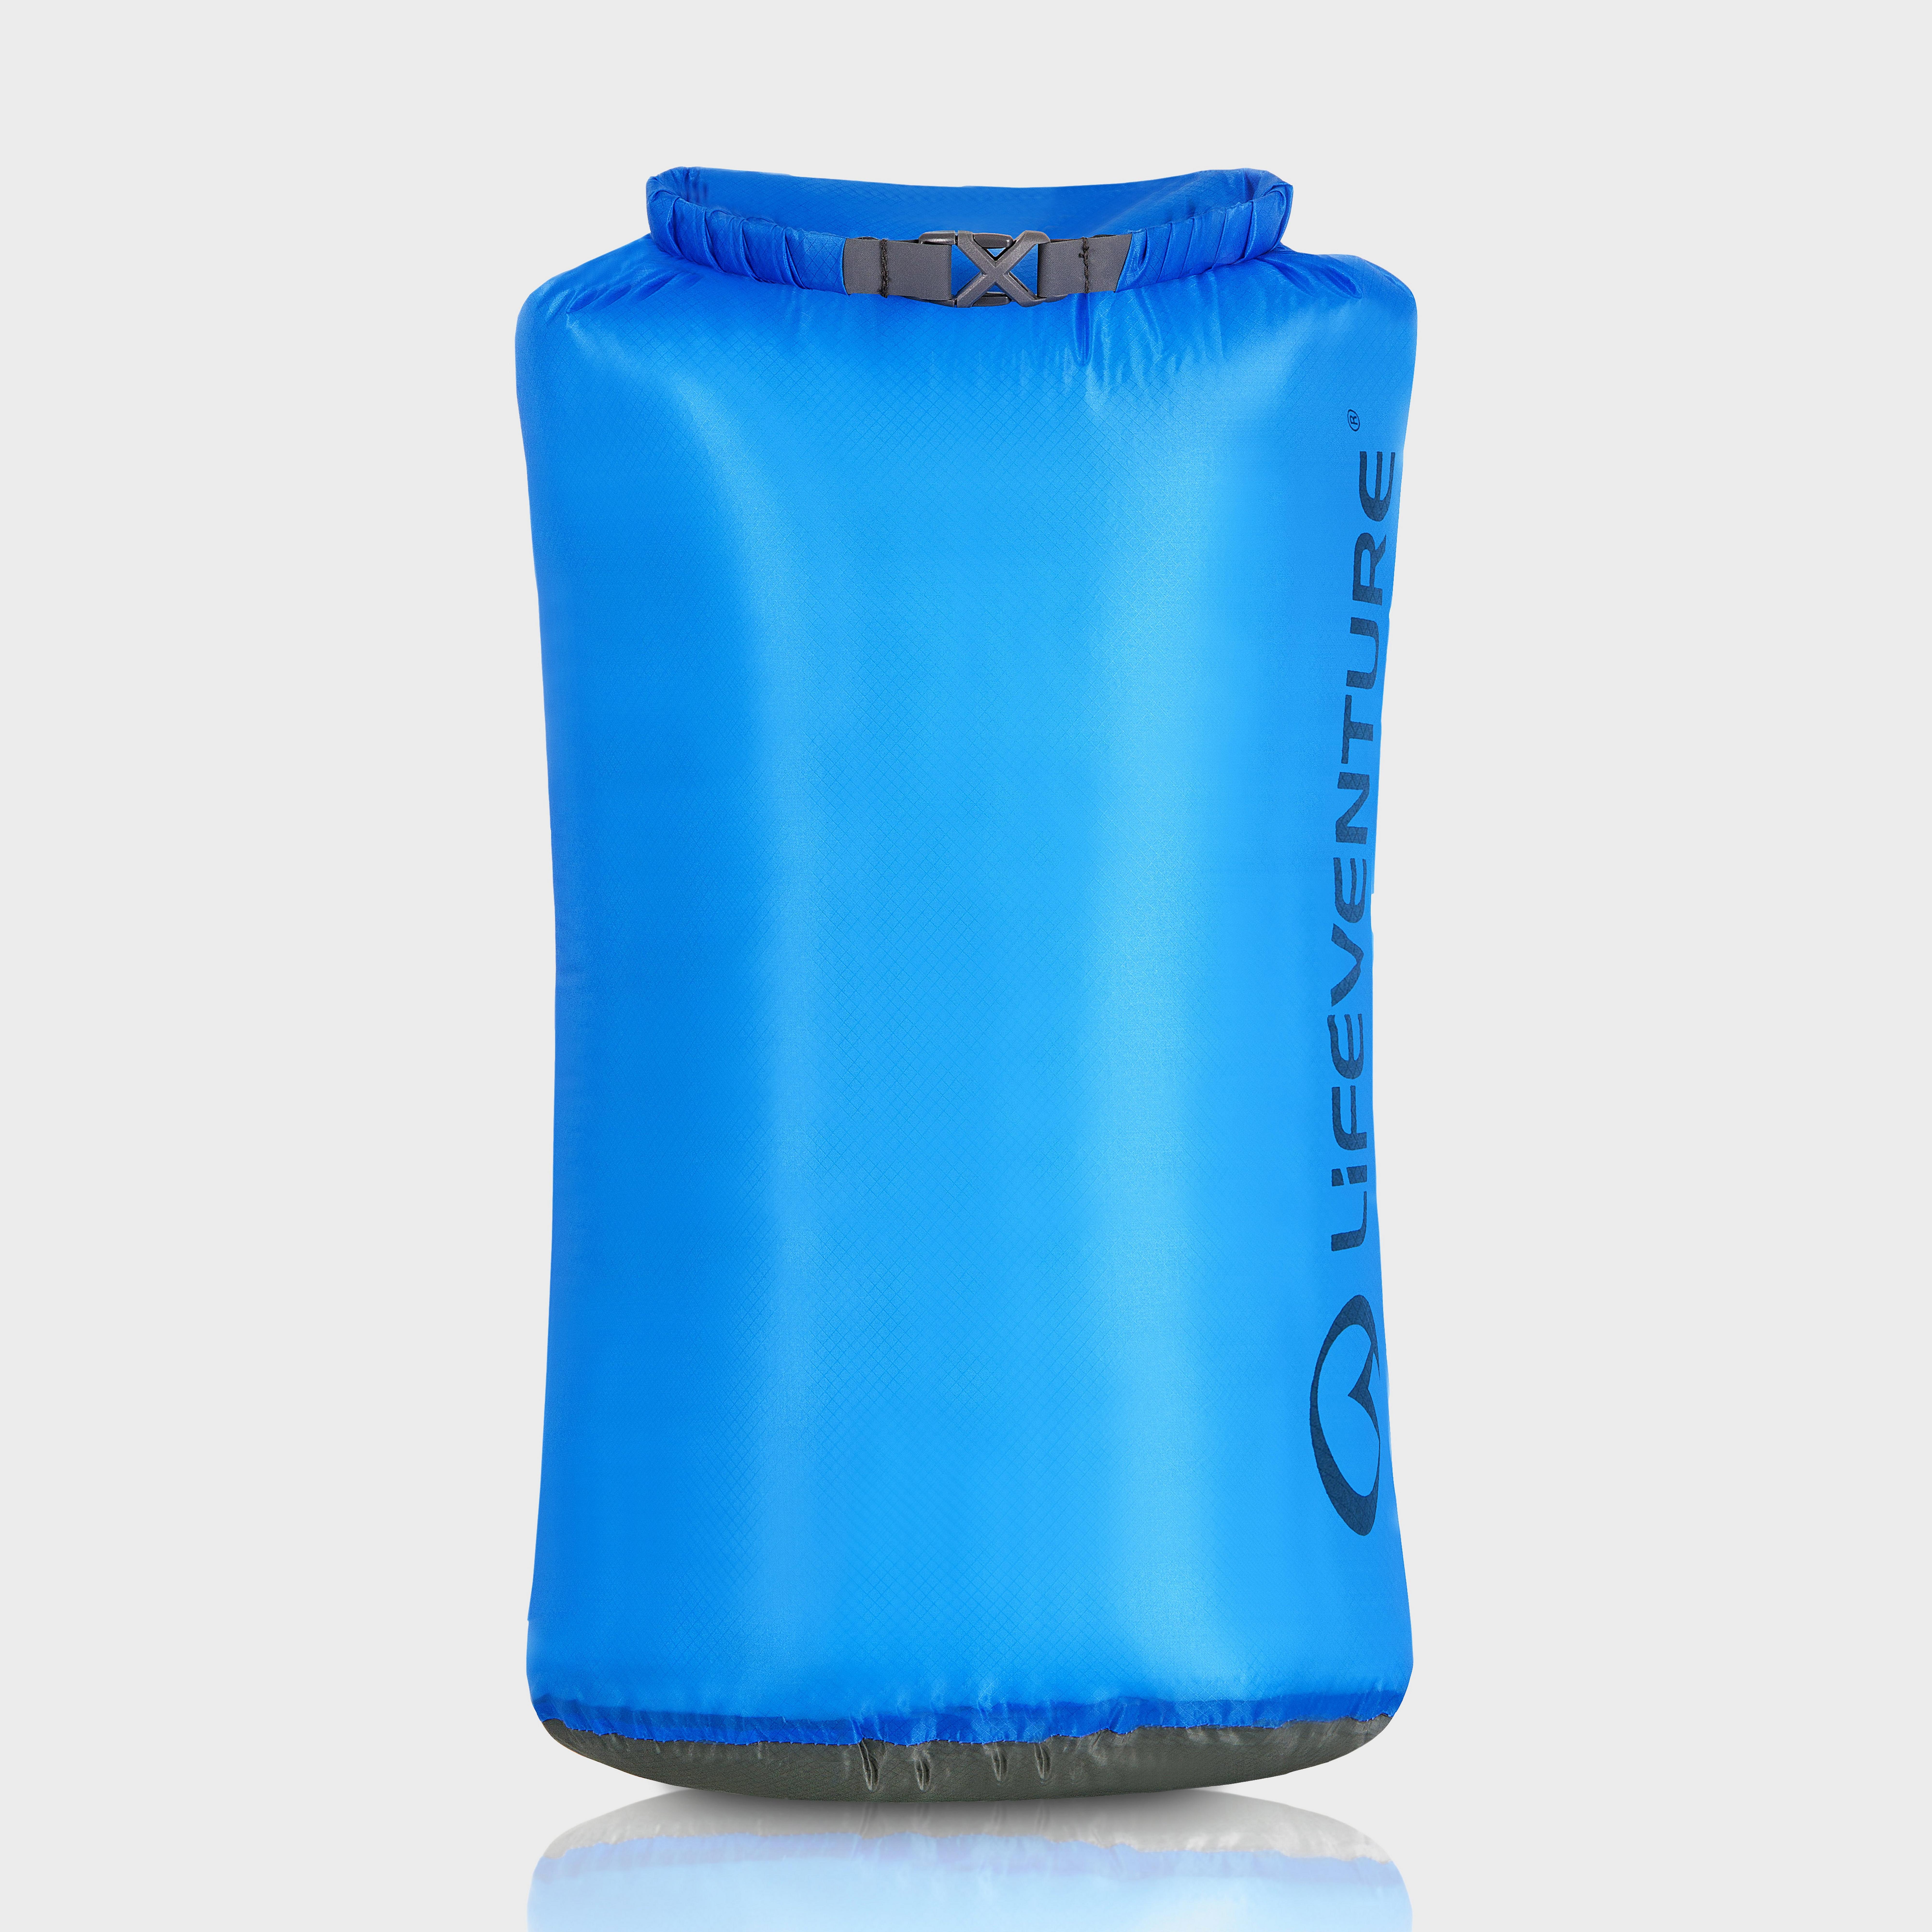 Lifeventure Lifeventure Ultralight 35L Dry Bag - N/A, N/A